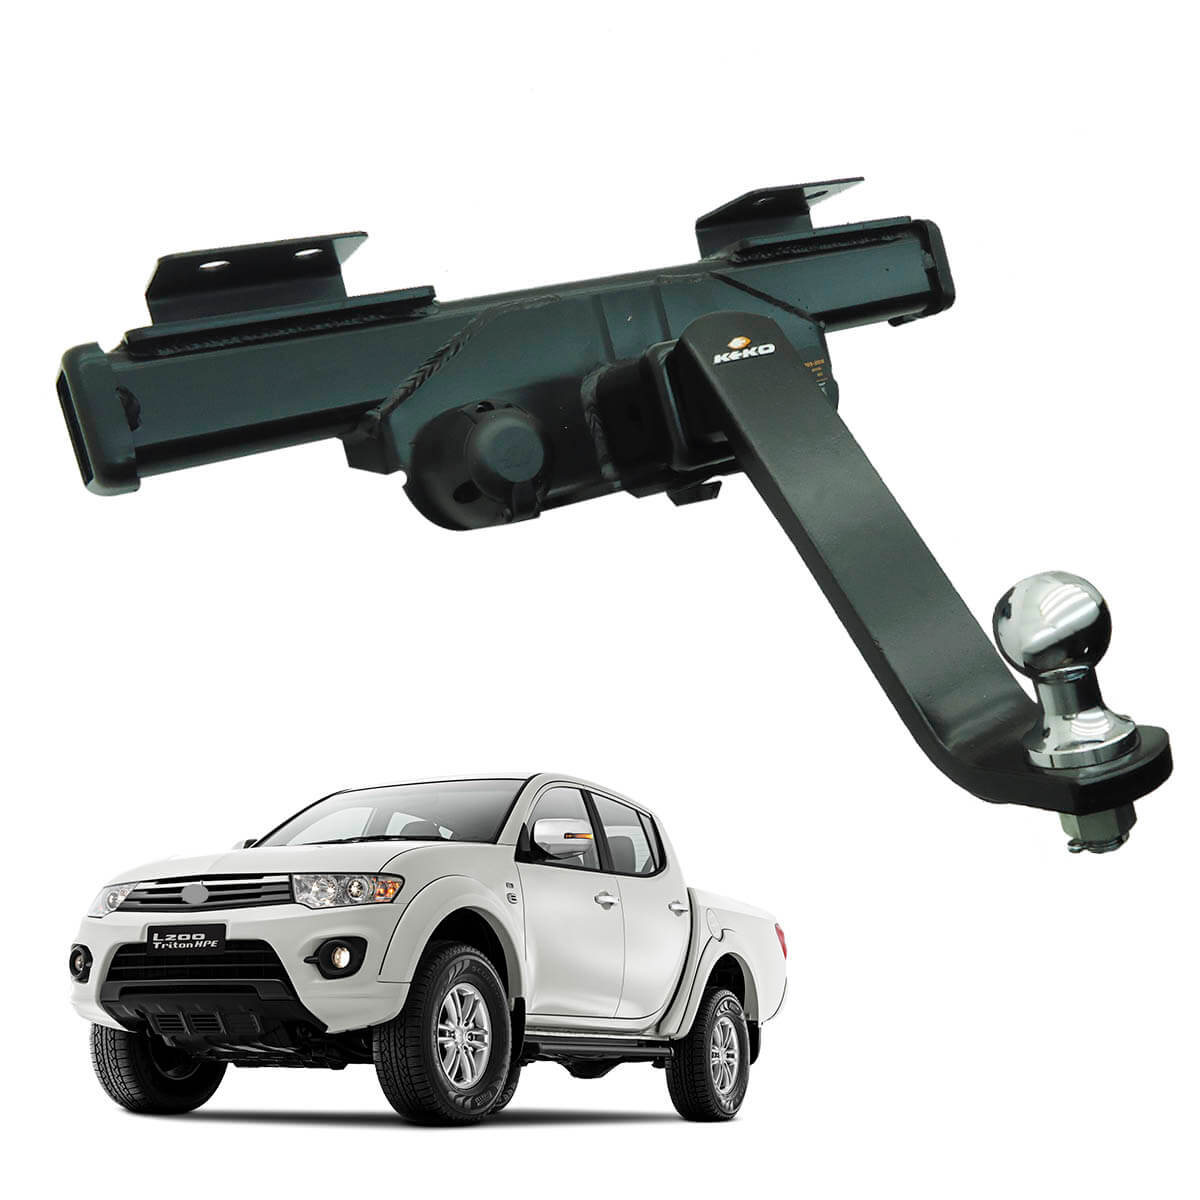 Engate de reboque L200 Triton 2012 a 2016 GLX GLS Outdoor Keko K1 removível 1500 kg